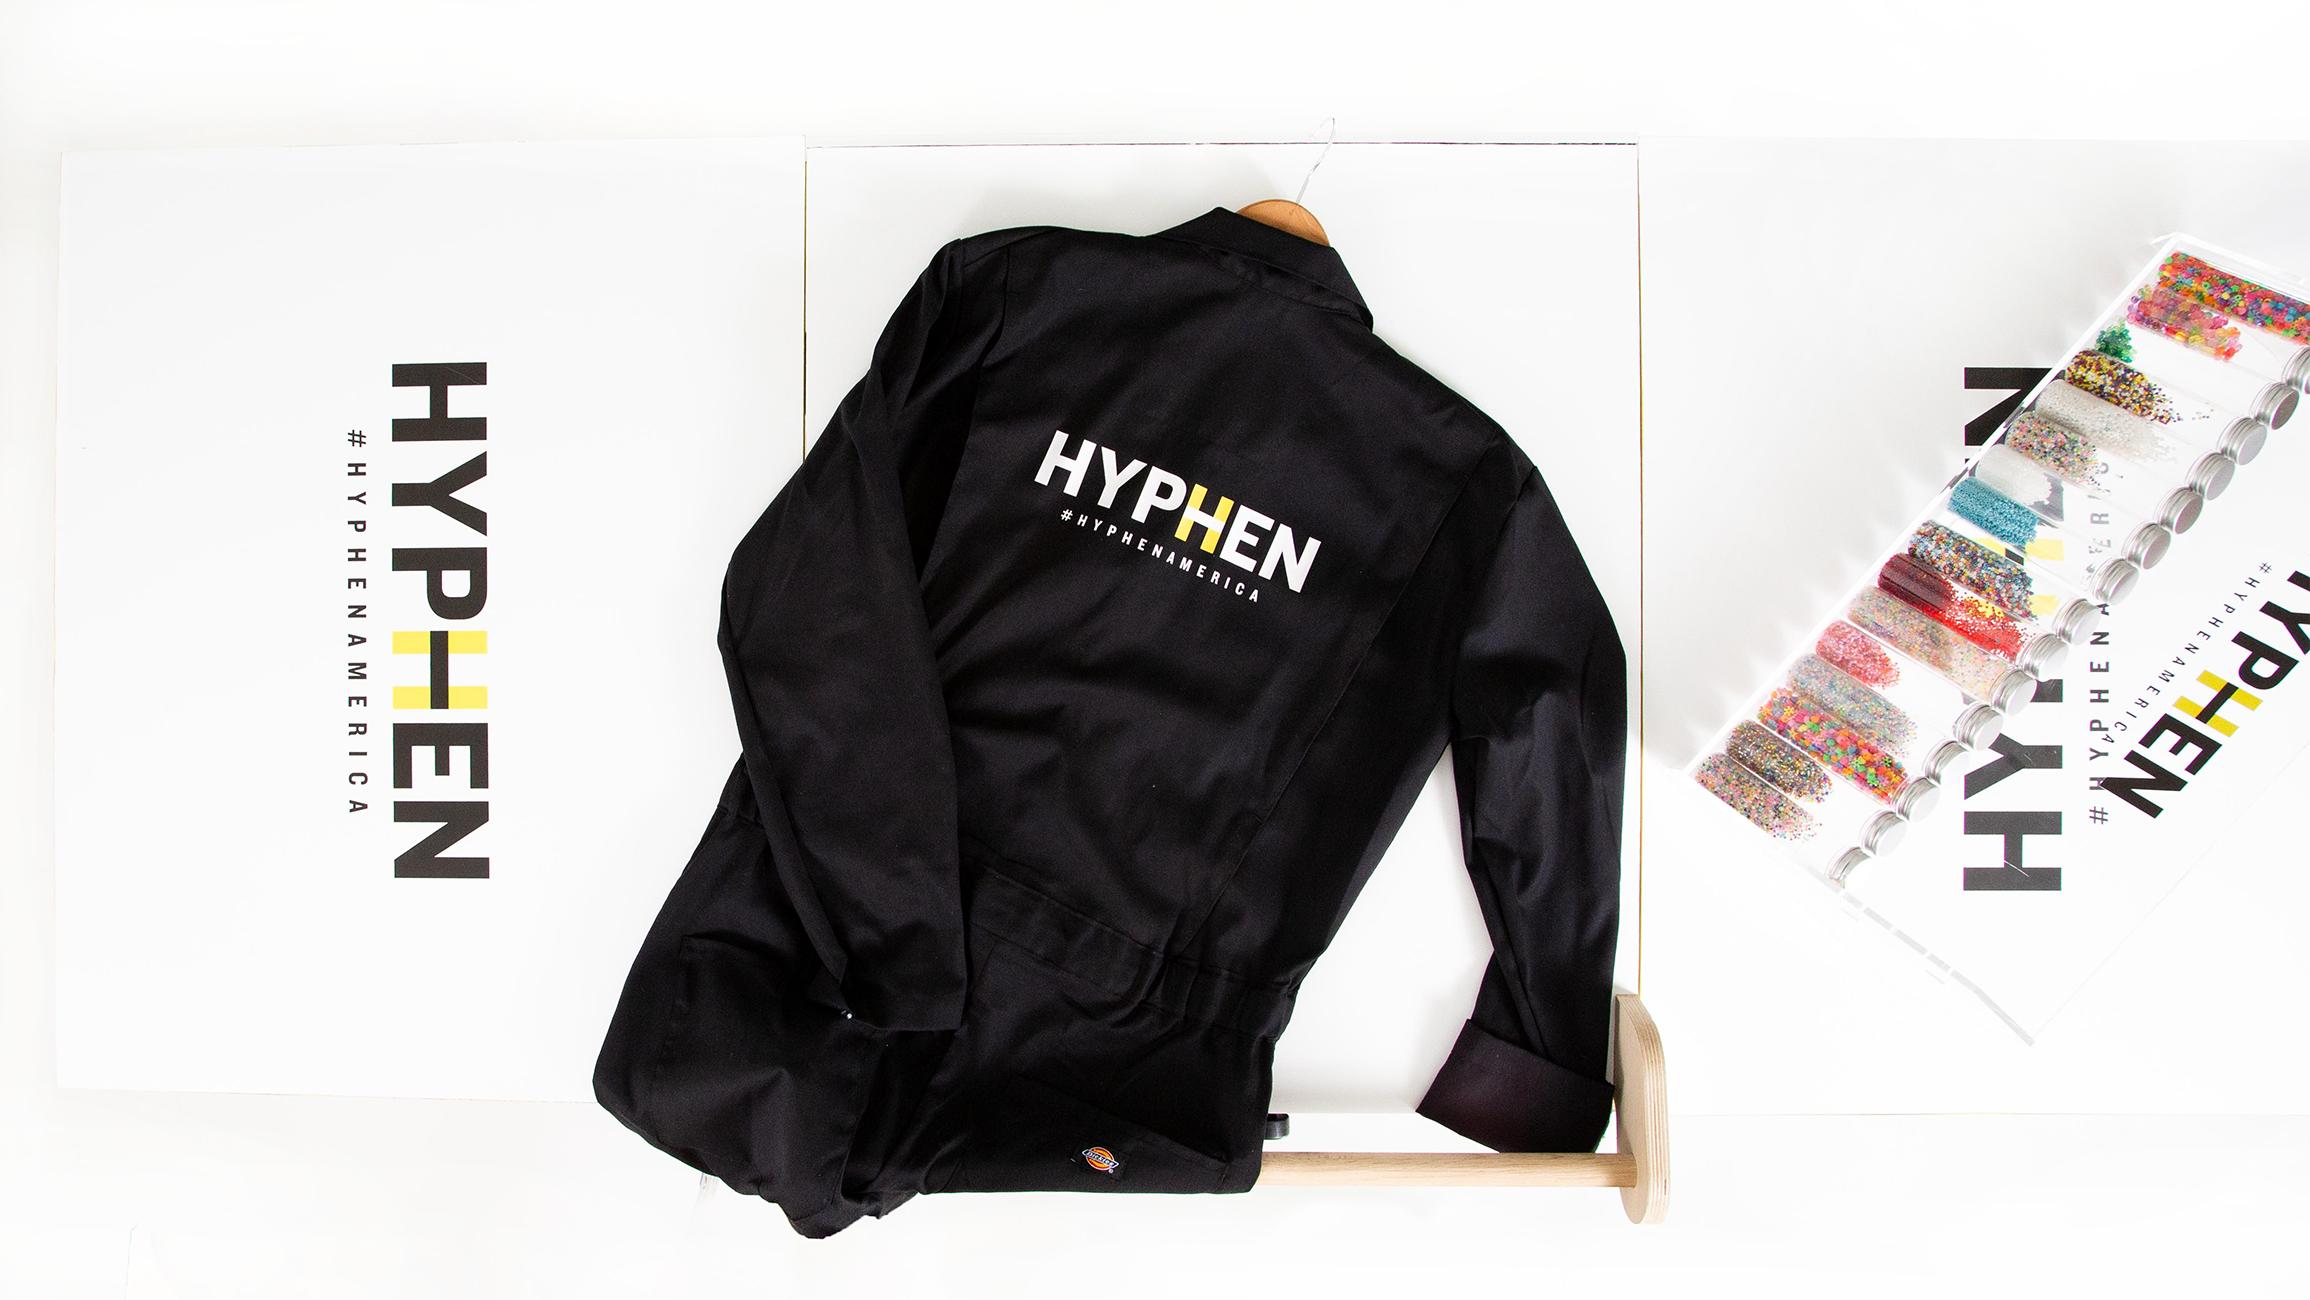 Hyphen_Props_9956.png